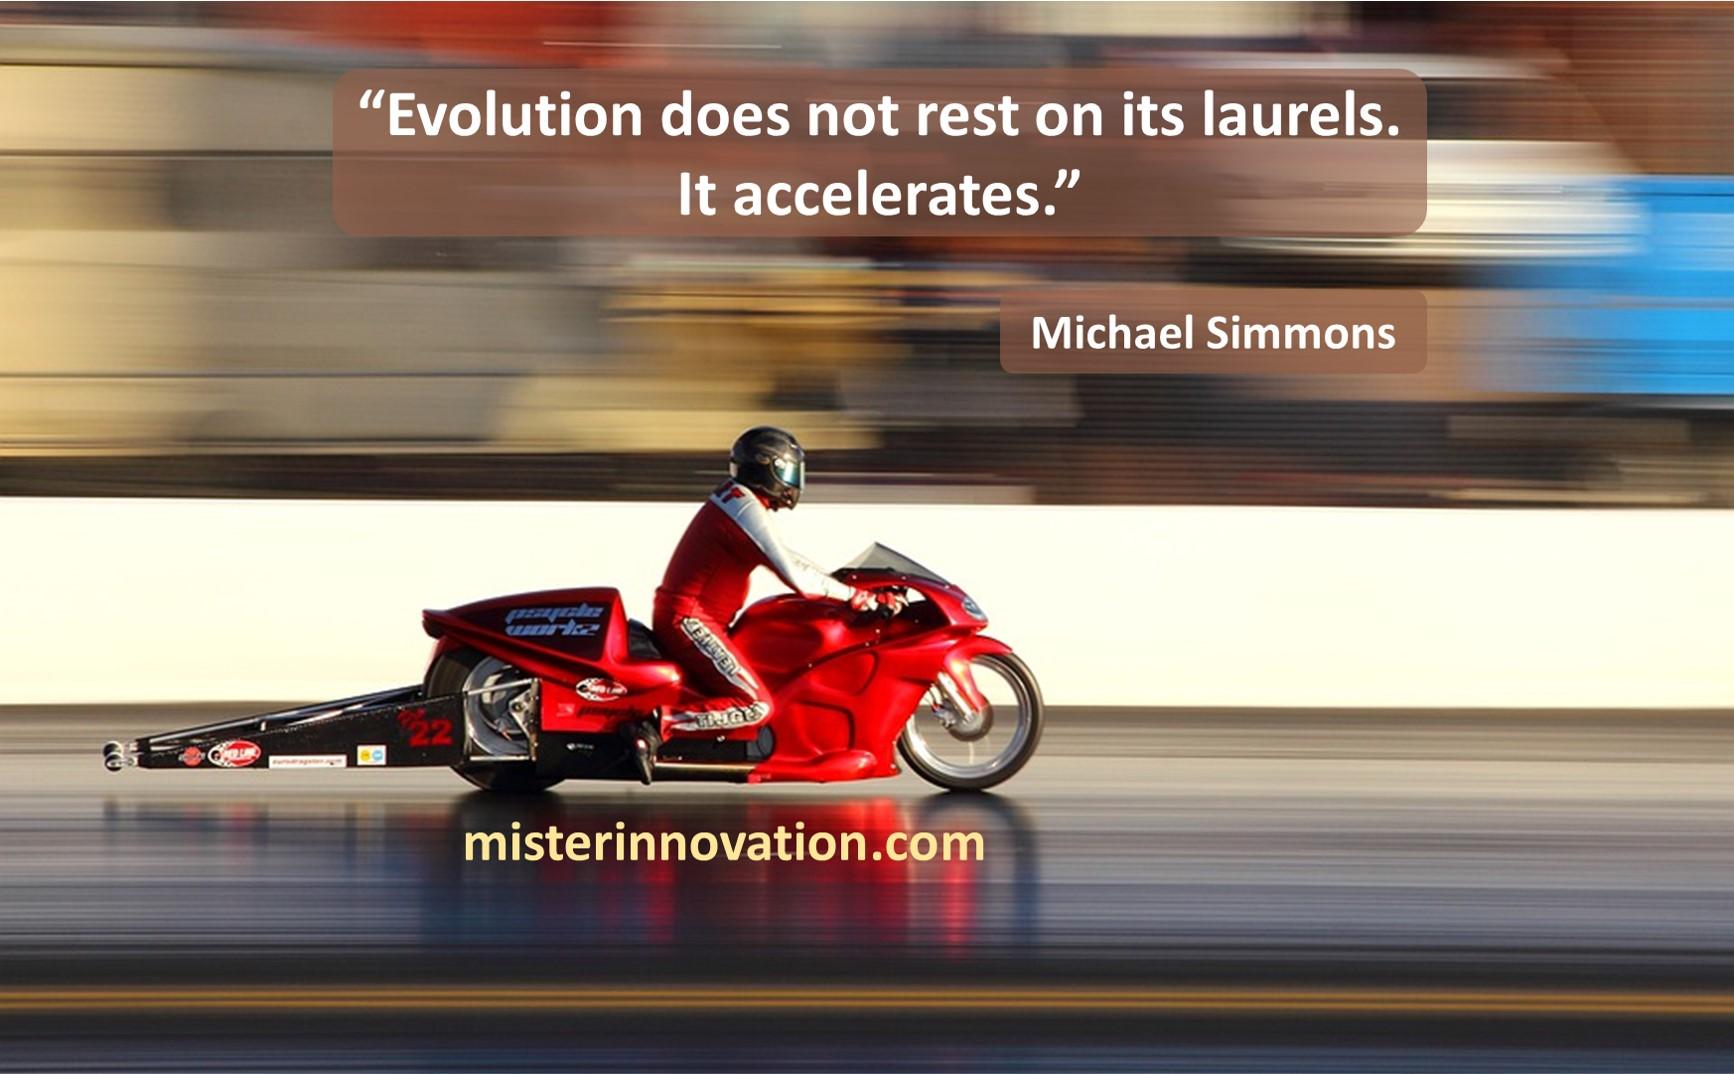 Michael Simmons Acceleration